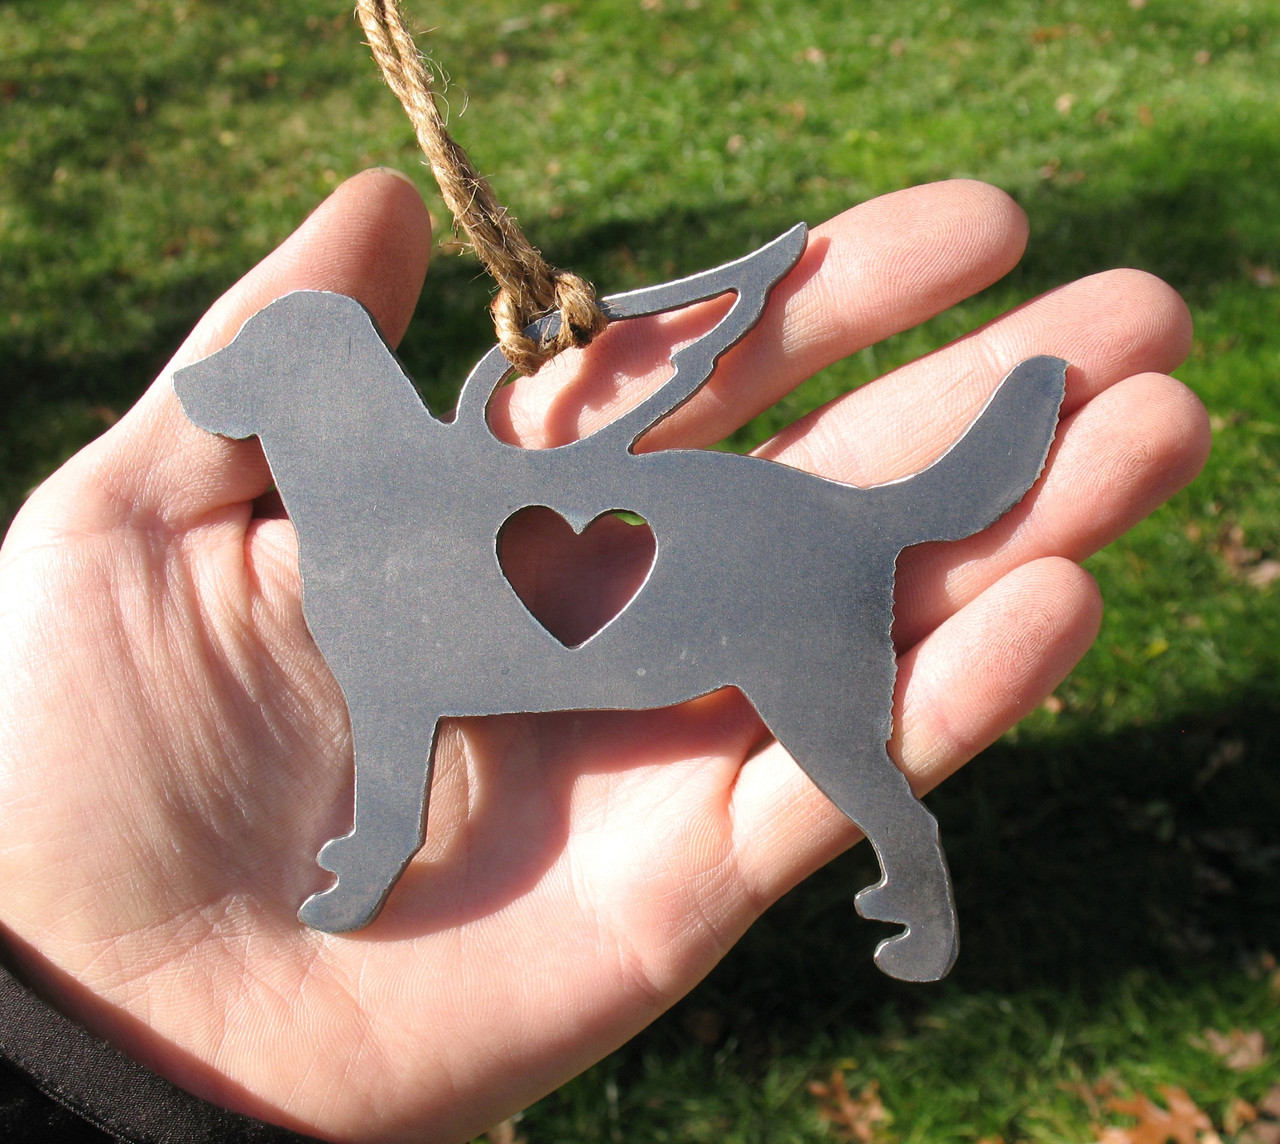 Labrador Retriever 4 Pet Loss Gift Ornament Angel - Pet Memorial - Dog Sympathy Remembrance Gift - Metal Dog Christmas Ornament